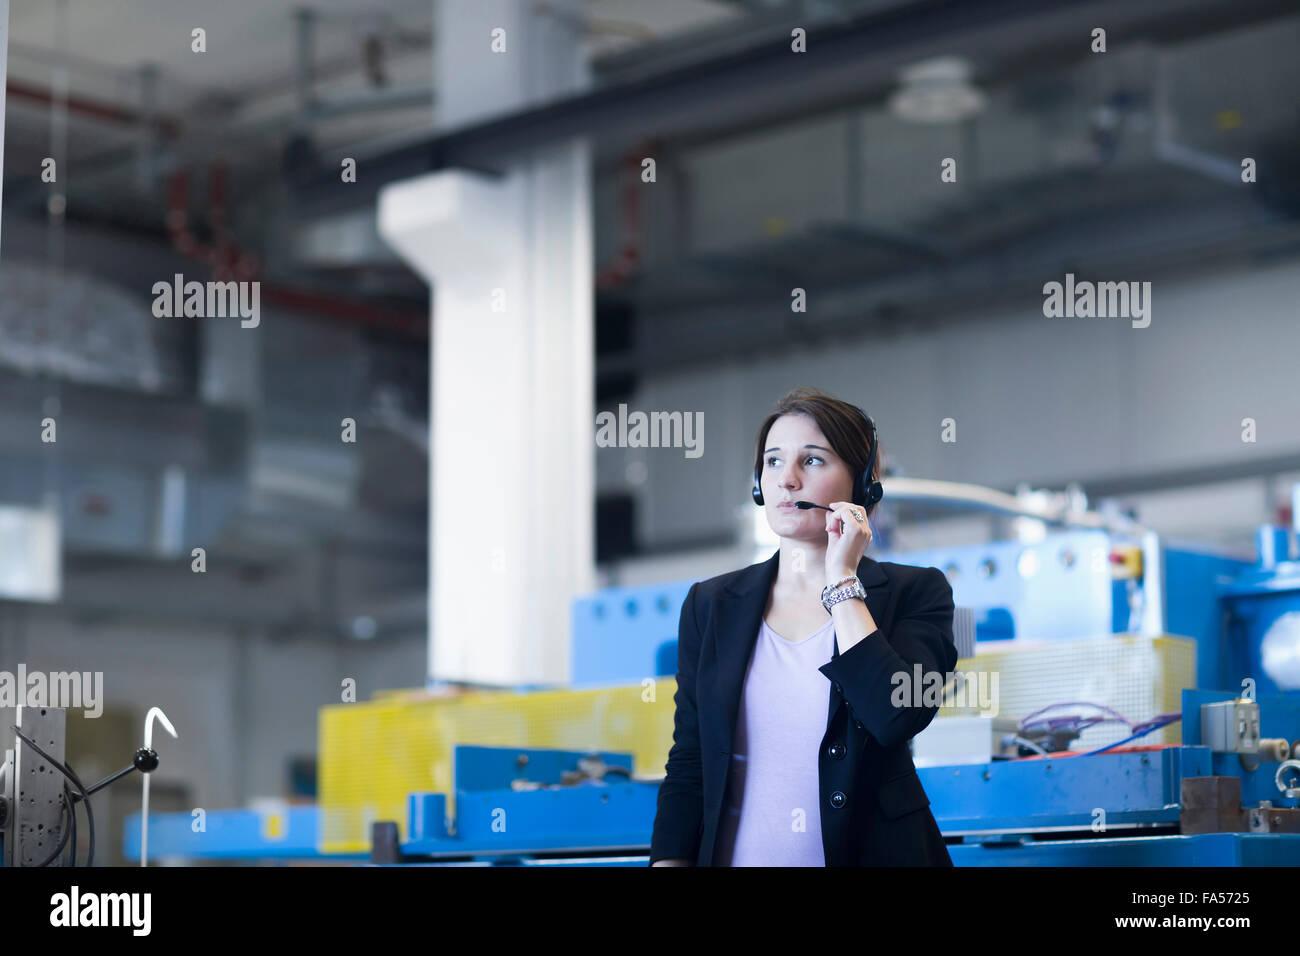 Ingénieur femelle portant casque dans une installation industrielle, Freiburg im Breisgau, Bade-Wurtemberg, Allemagne Banque D'Images